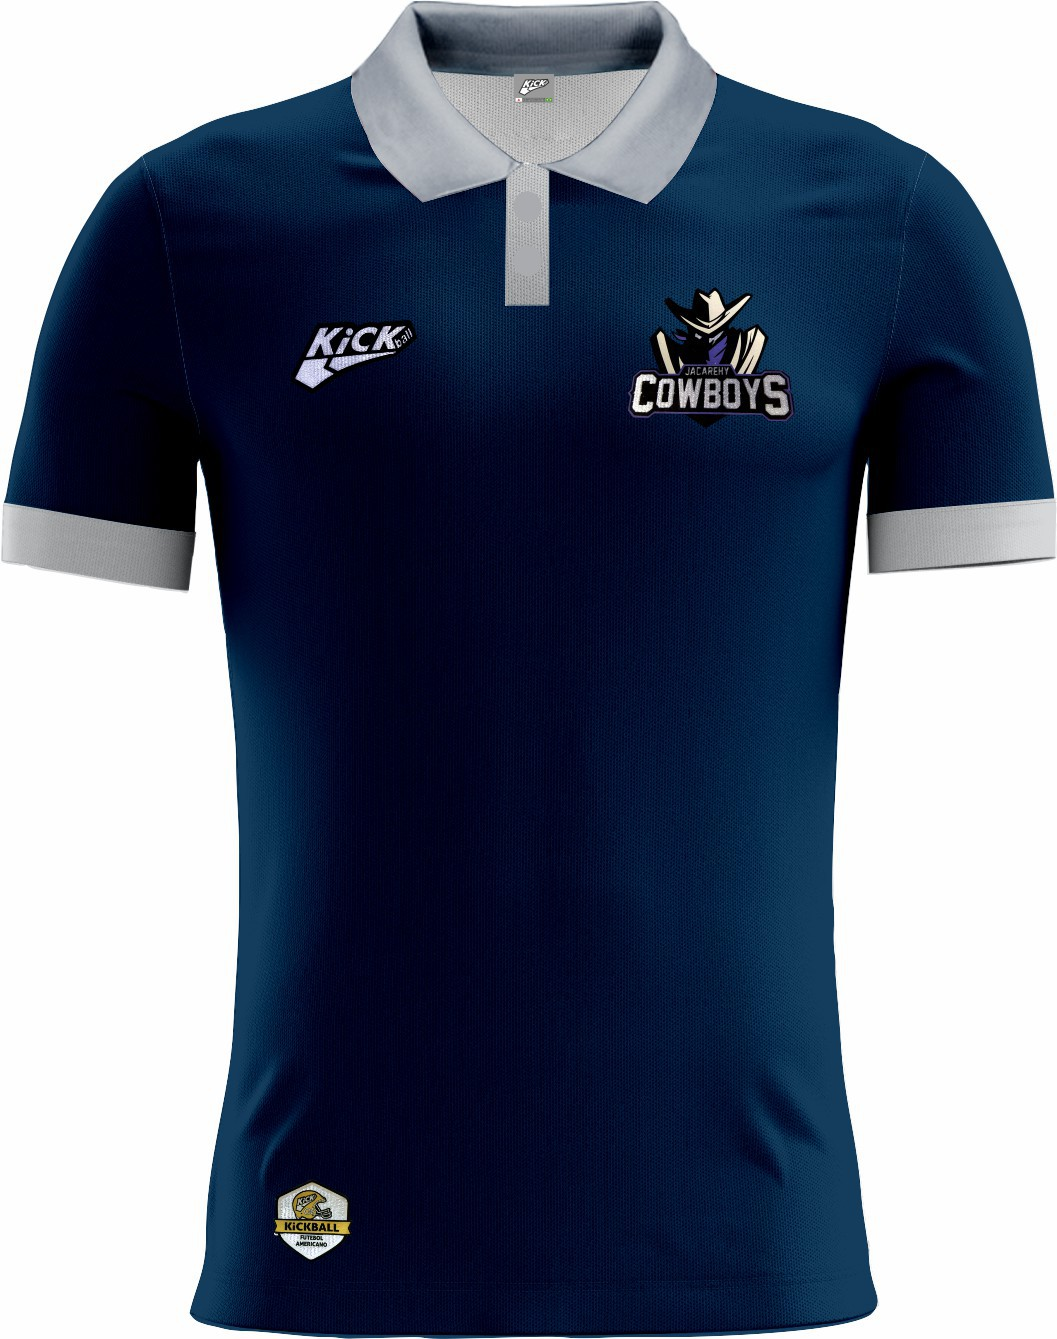 Camisa Of. Jacarehy Cowboys Tryout Polo Masc. Mod2